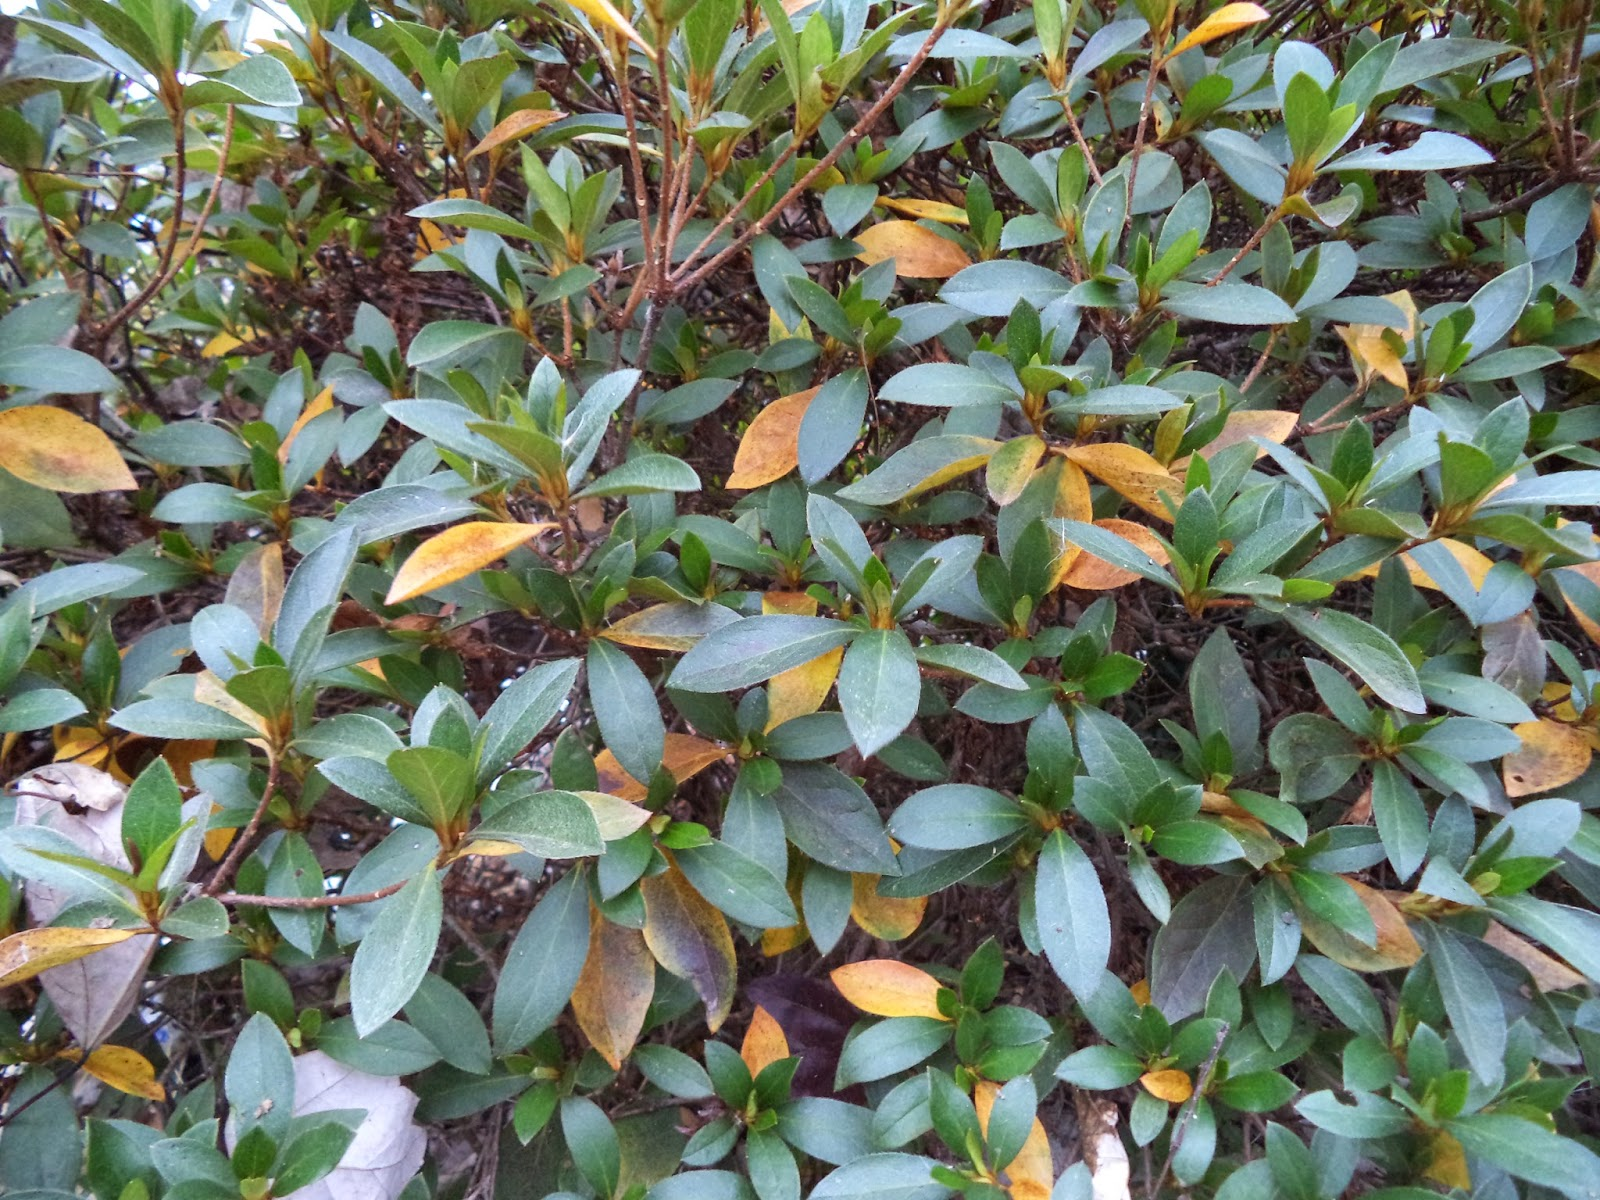 Uga extension in cobb county azalea leaves turning yellow dropping azalea leaves turning yellow dropping mightylinksfo